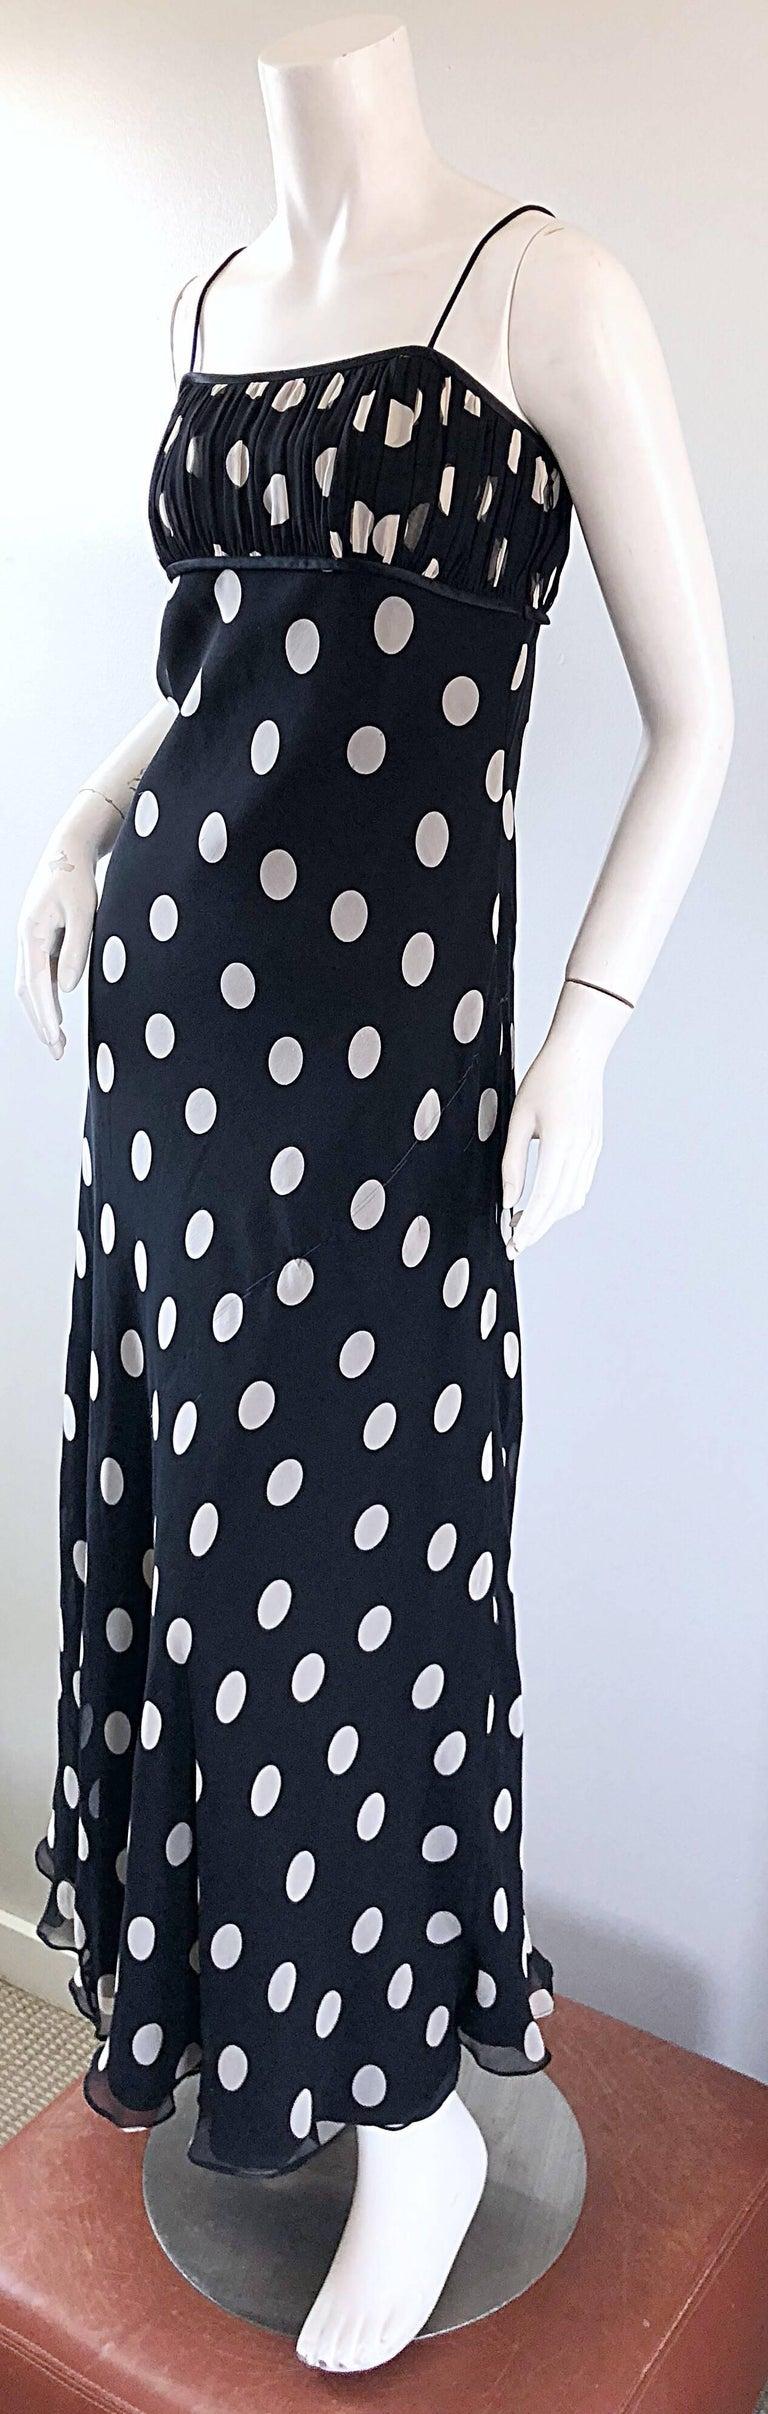 Women's 1990s Abriele Melano Black and White Polka Dot Silk Chiffon Maxi Dress 90s Gown For Sale